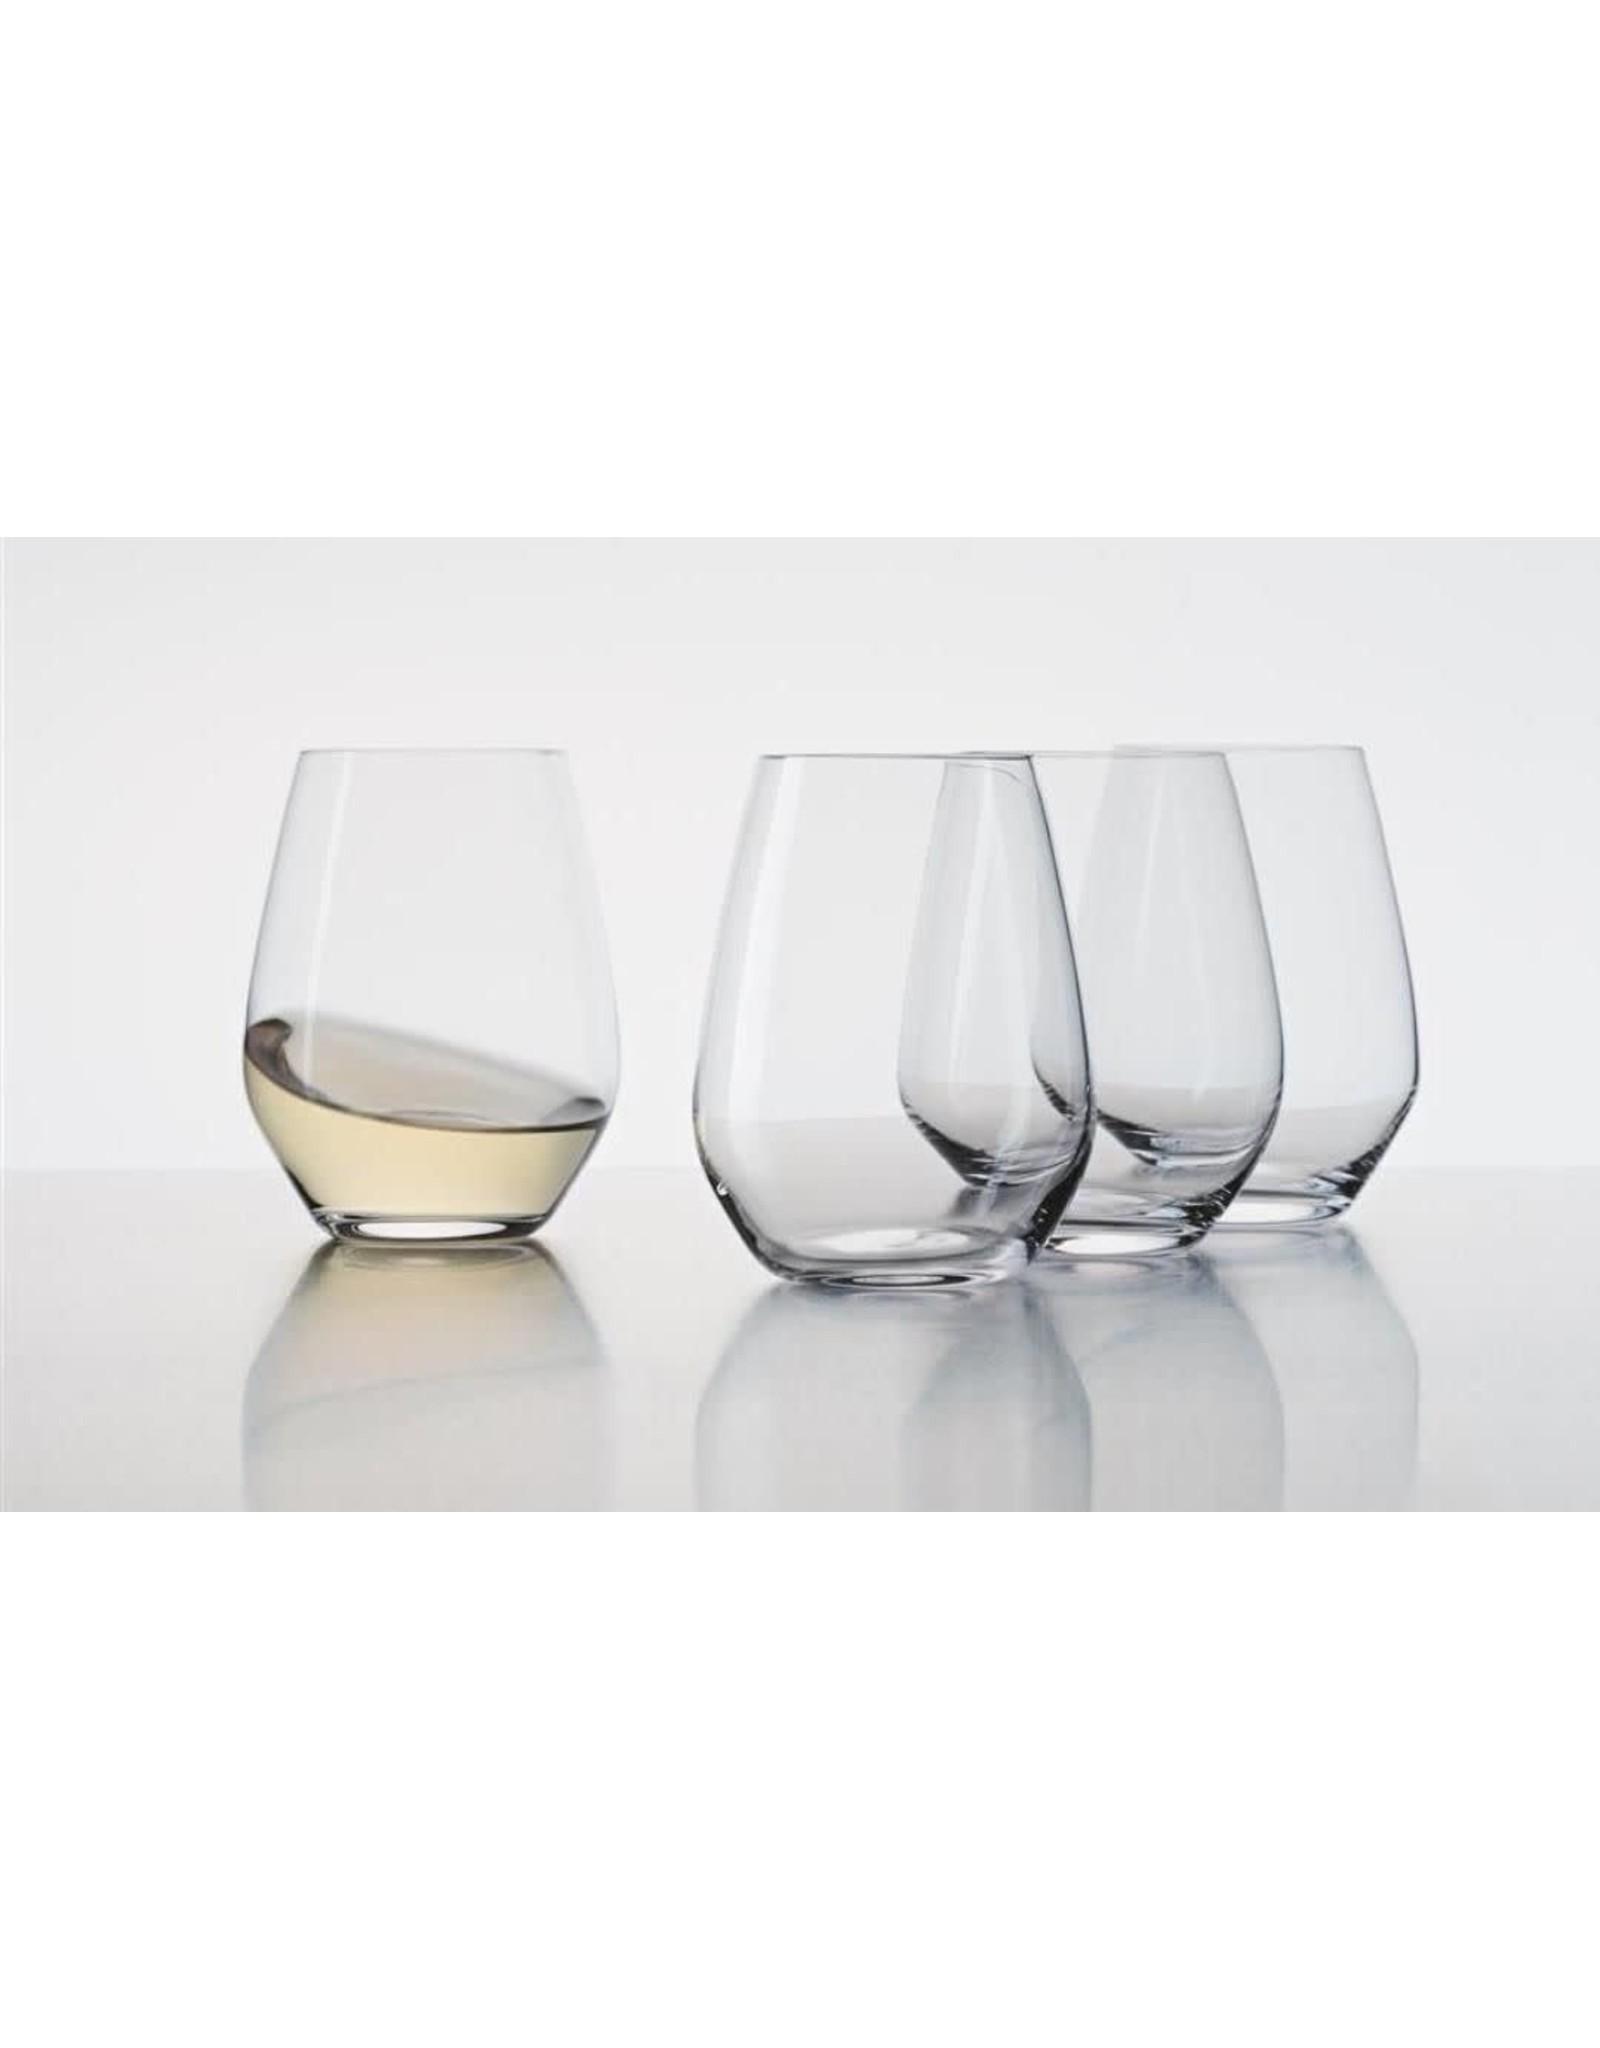 spiegelau Spiegelau. Authentis Universeel glas 460 ml, set à 6 stuks